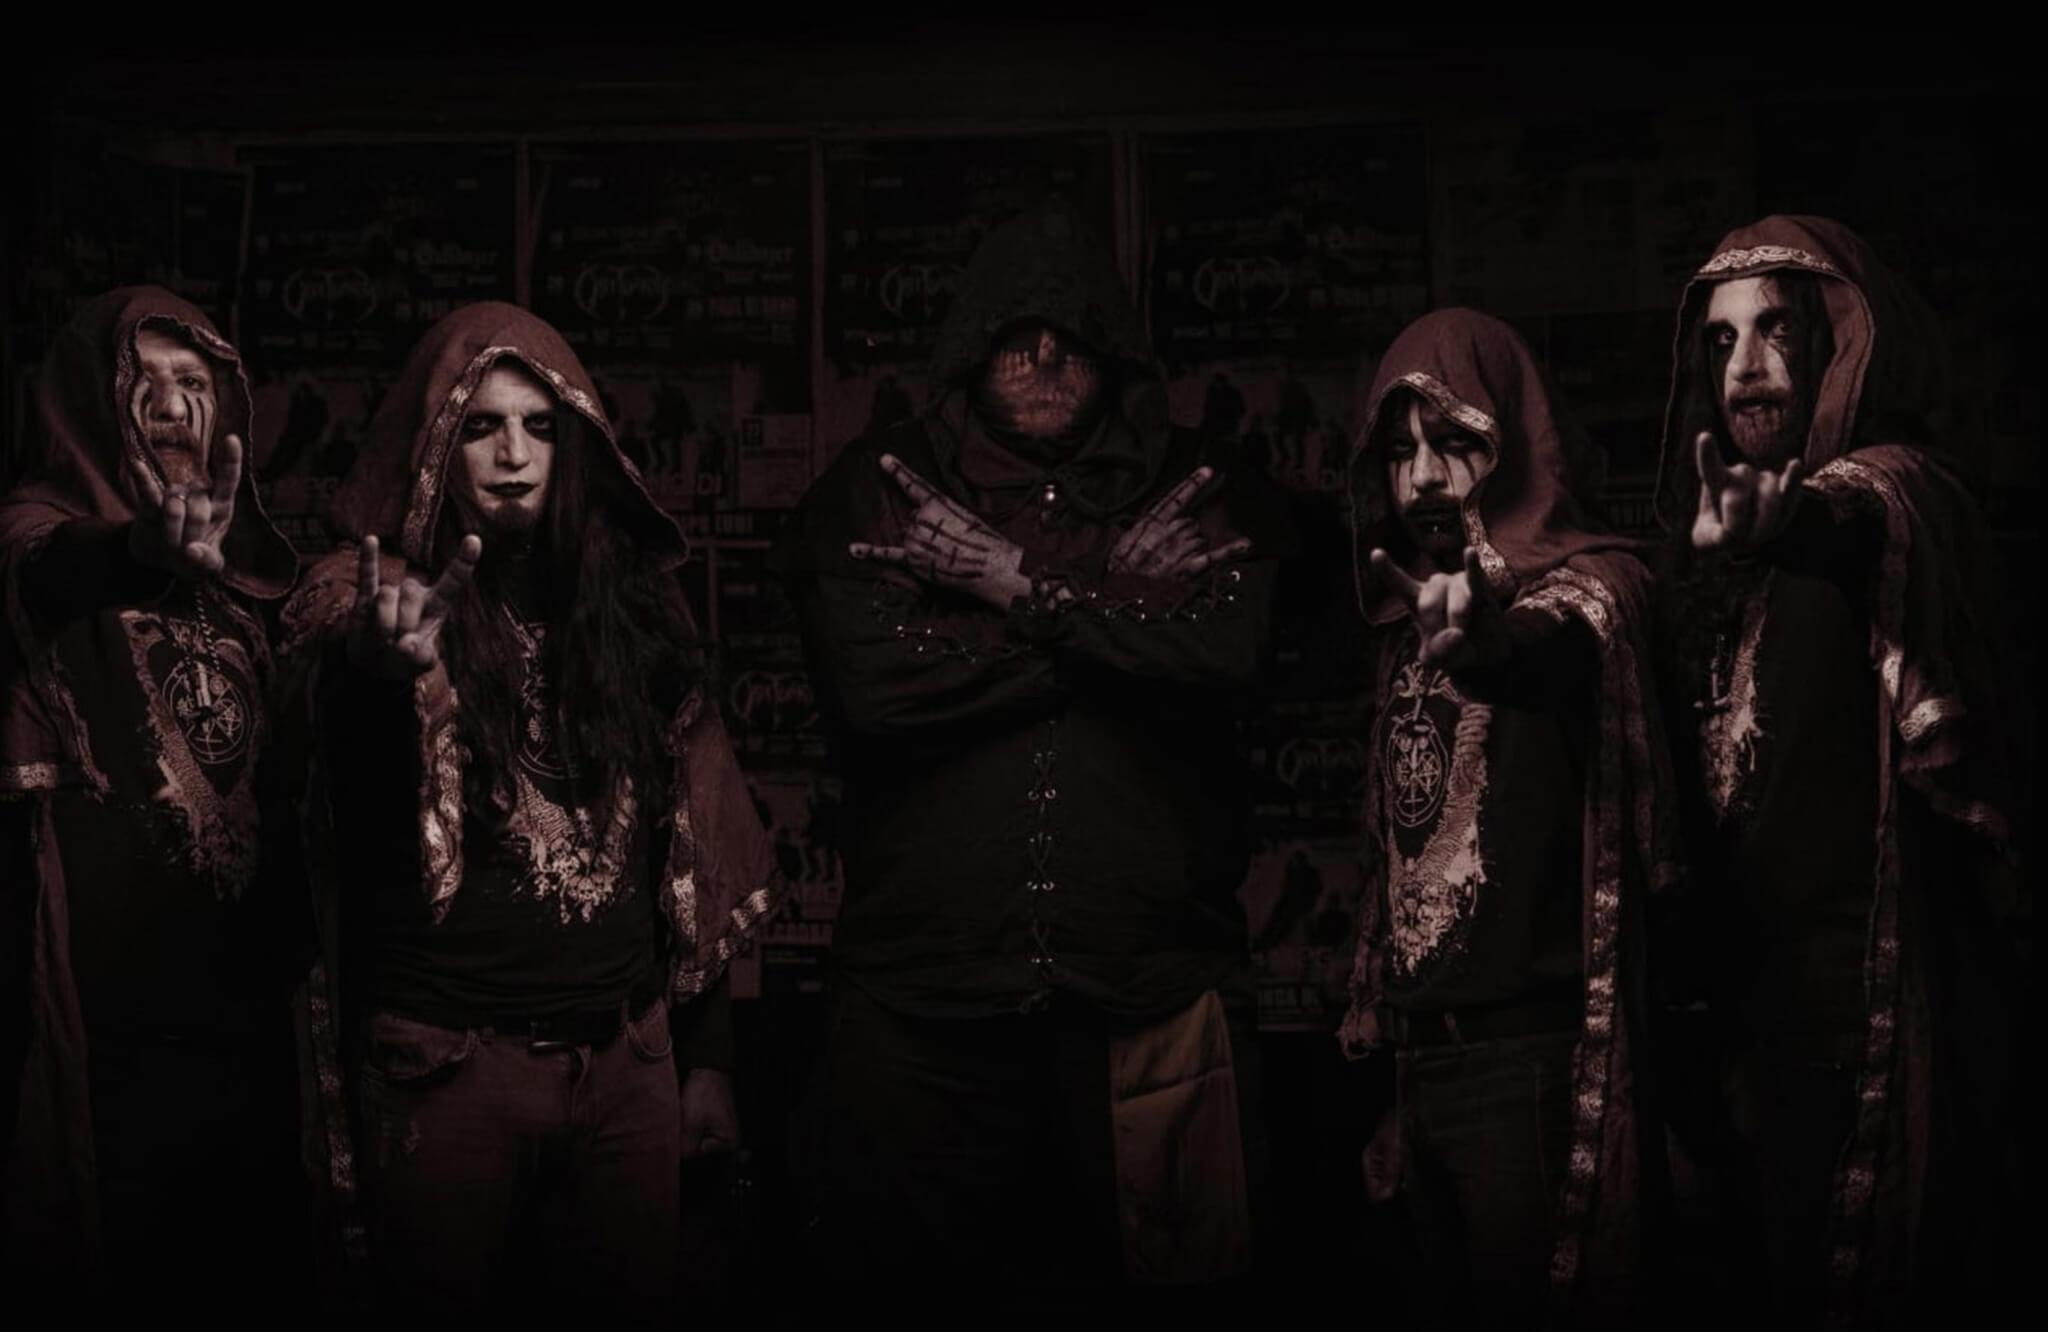 Dark image, 5 hooded figures pose with heavy metal makeup